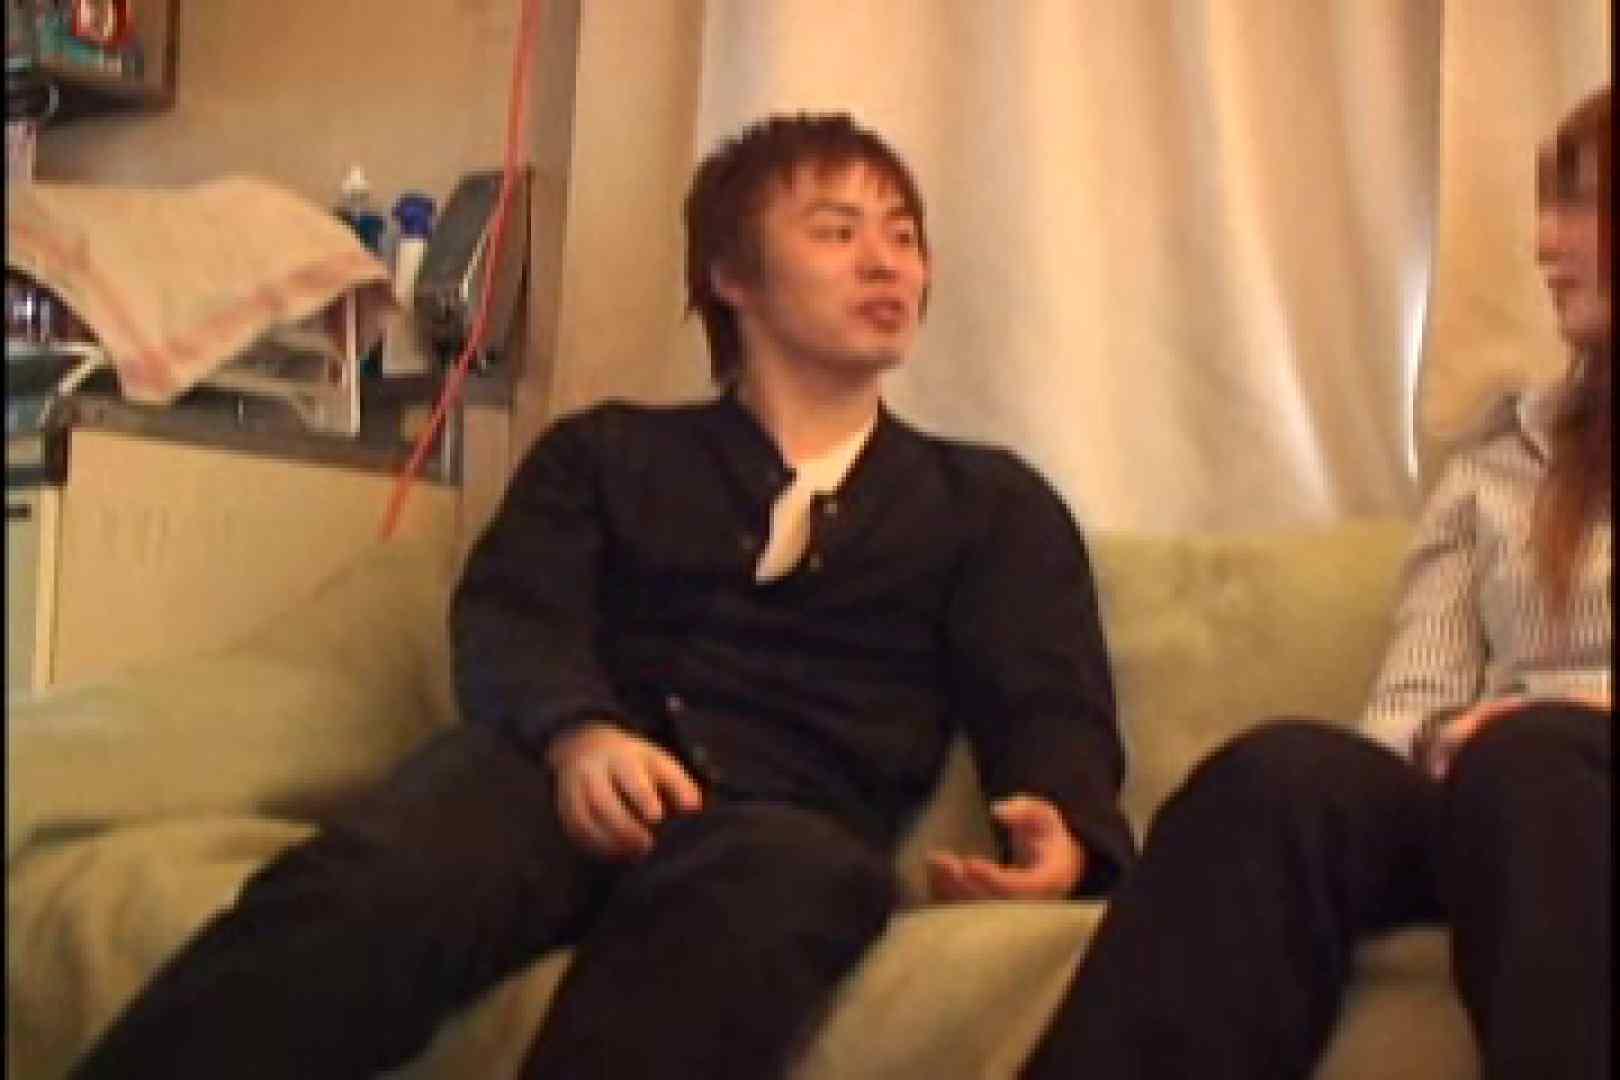 BEST OF イケメン!!男目線のガチSEX vol.03(対女性作品) ゲイのオナニー映像 | イケメンたち  56枚 15